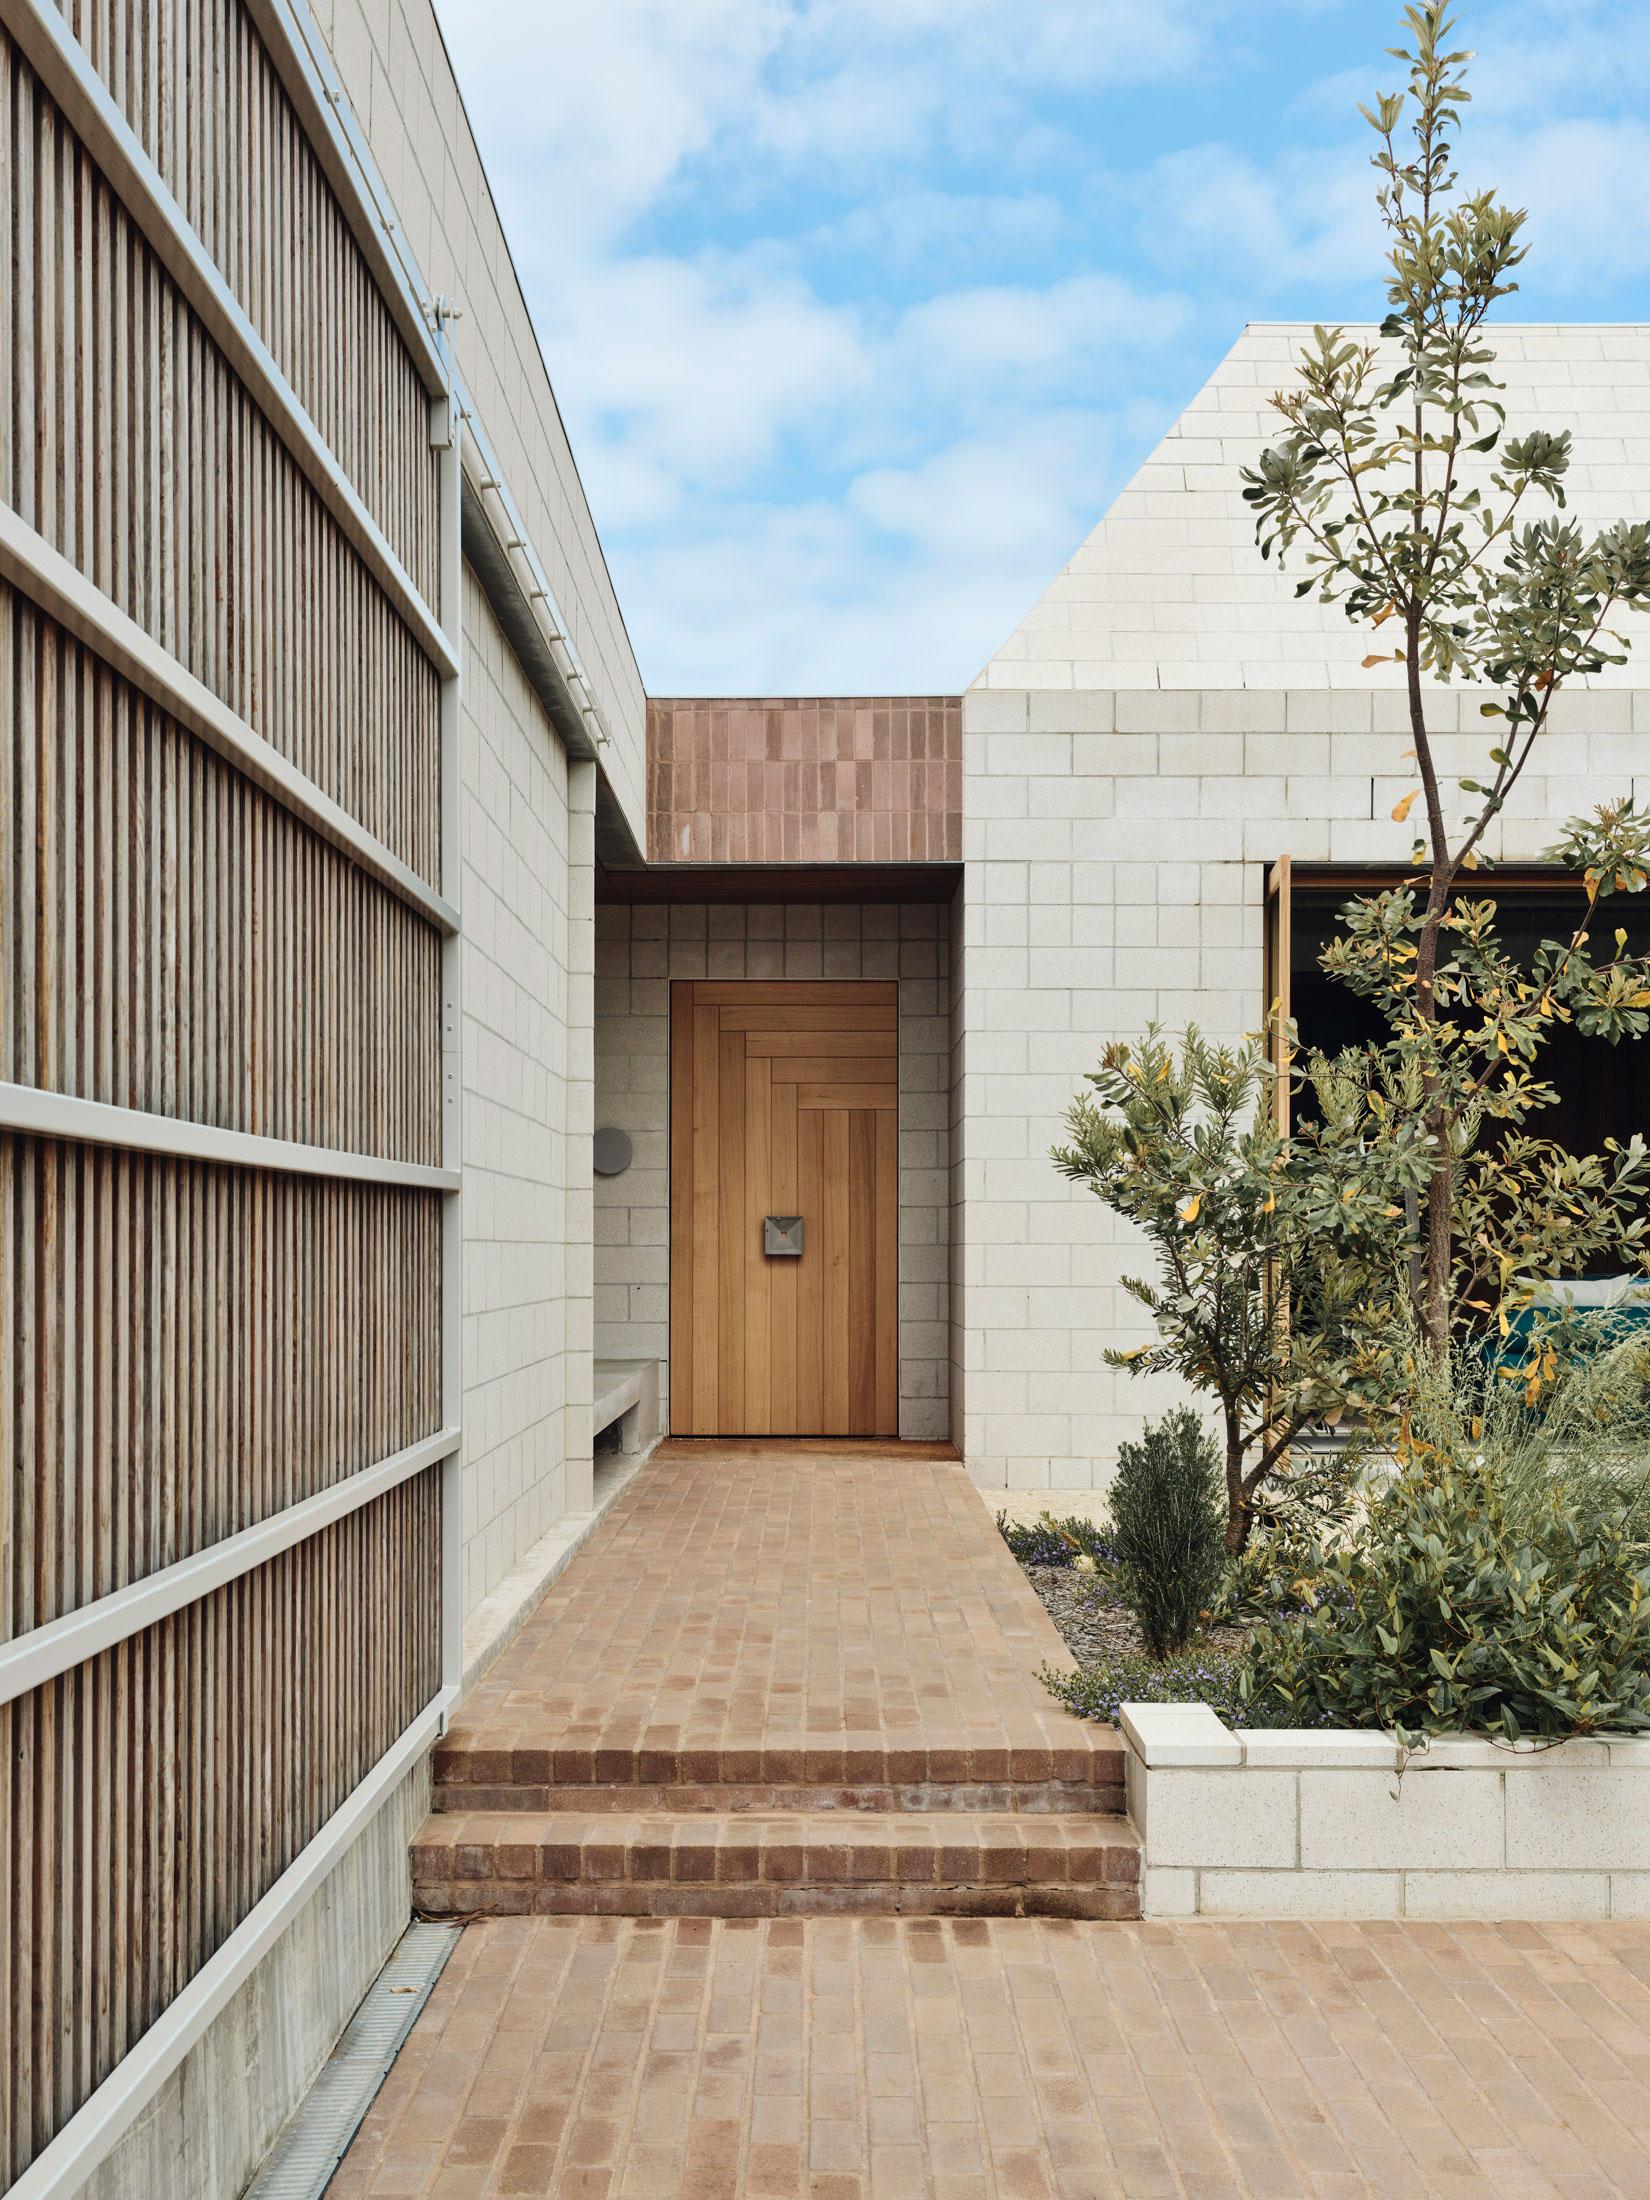 Architects Eat Bellows Beach House Flinders Masonry Architecture Photo Derek Swalwell Yellowtrace 14